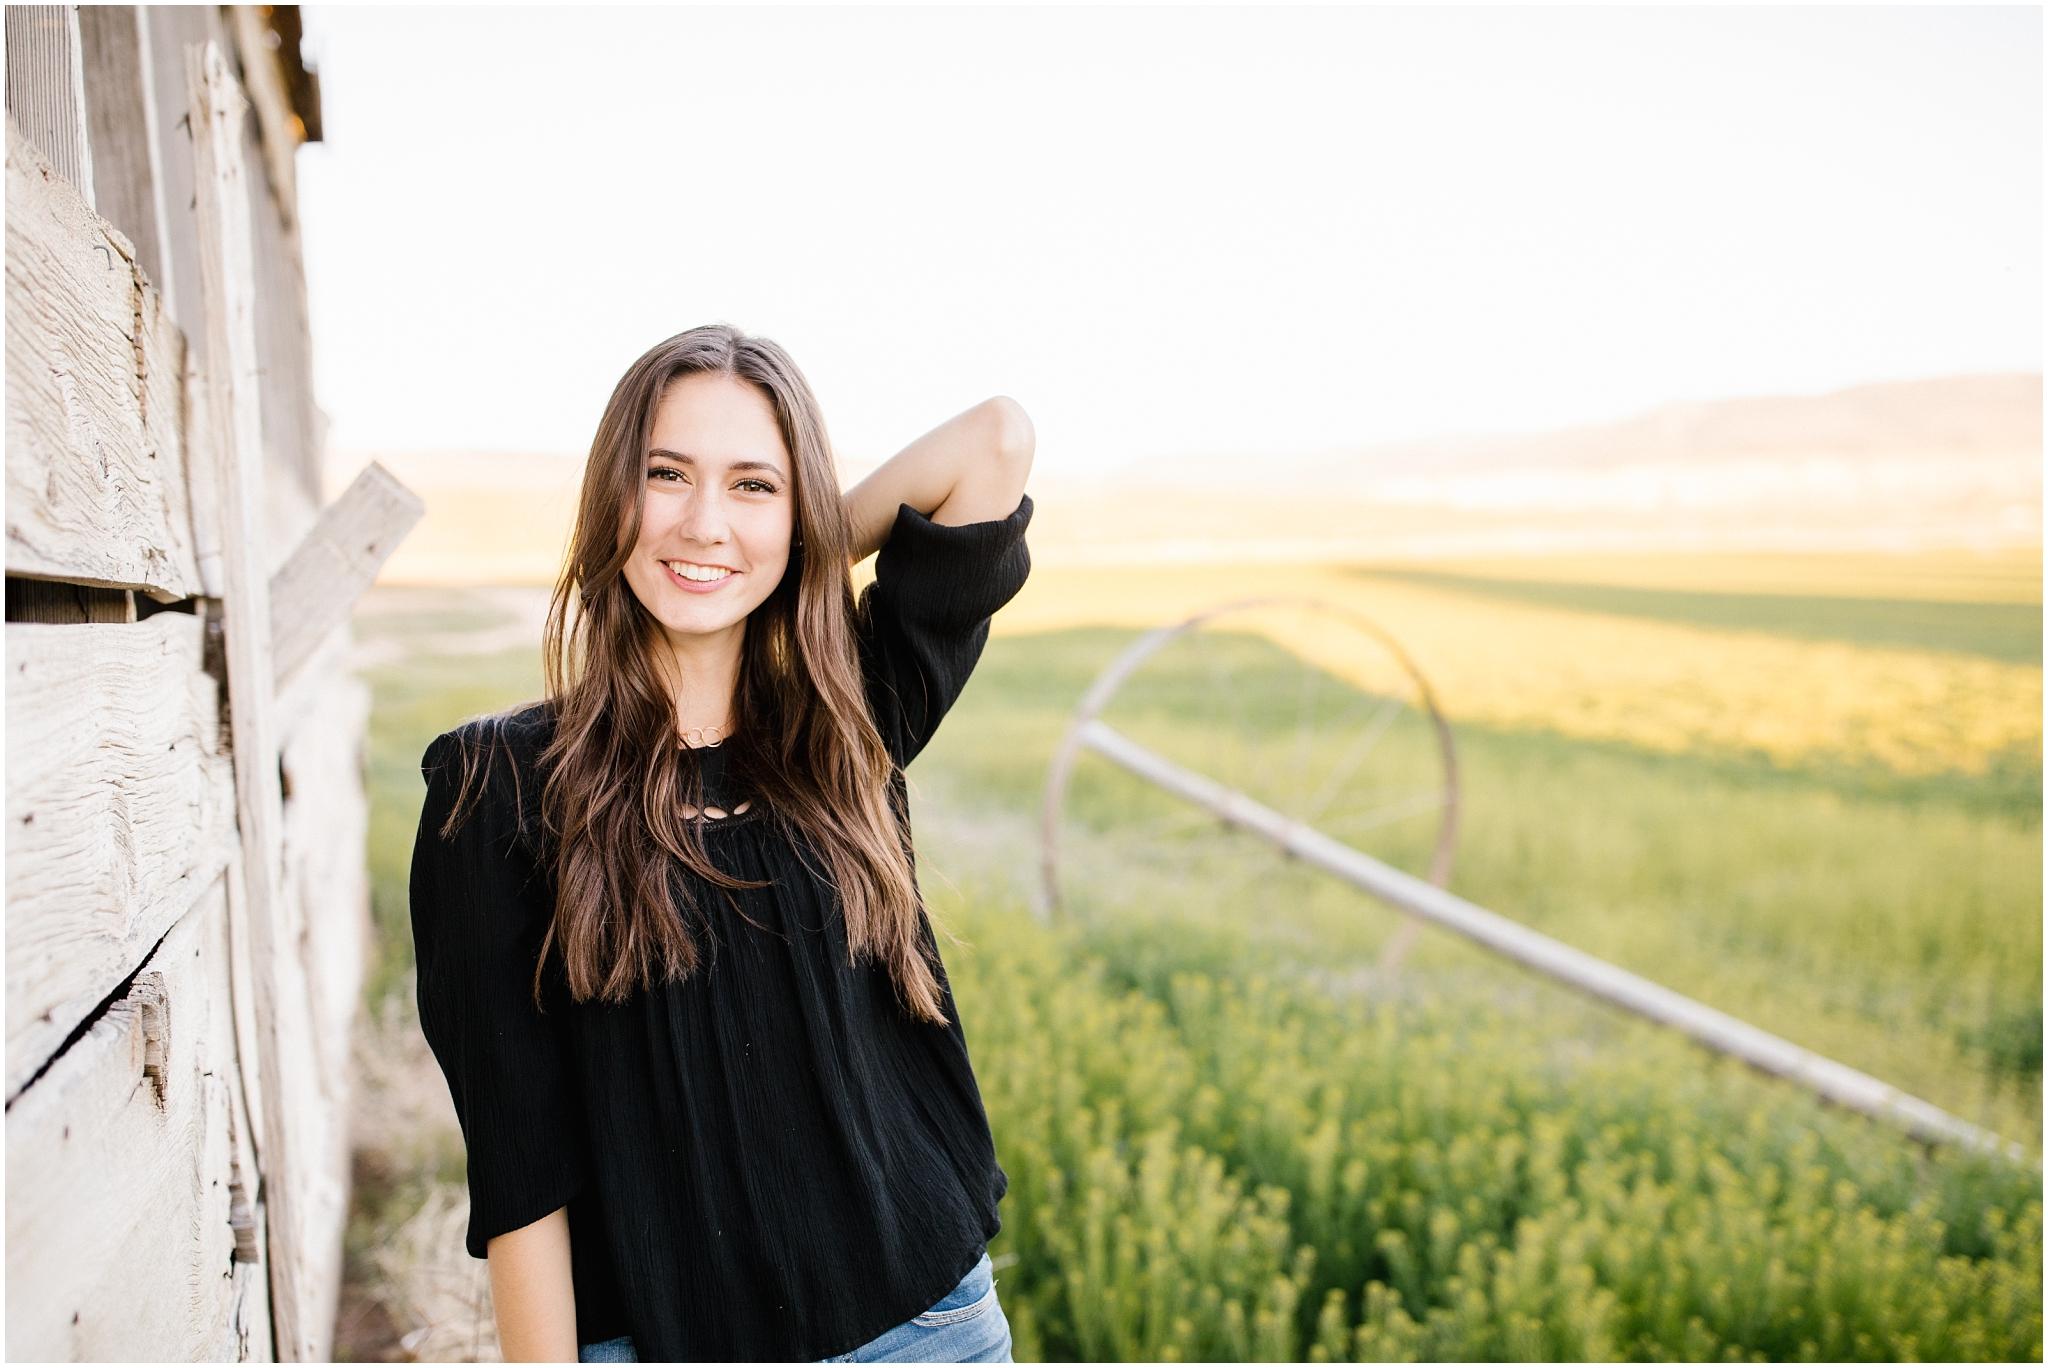 Lizzie-B-Imagery-Utah-Senior-Photographer-Central- Utah-Photographer-Utah-County_0028.jpg